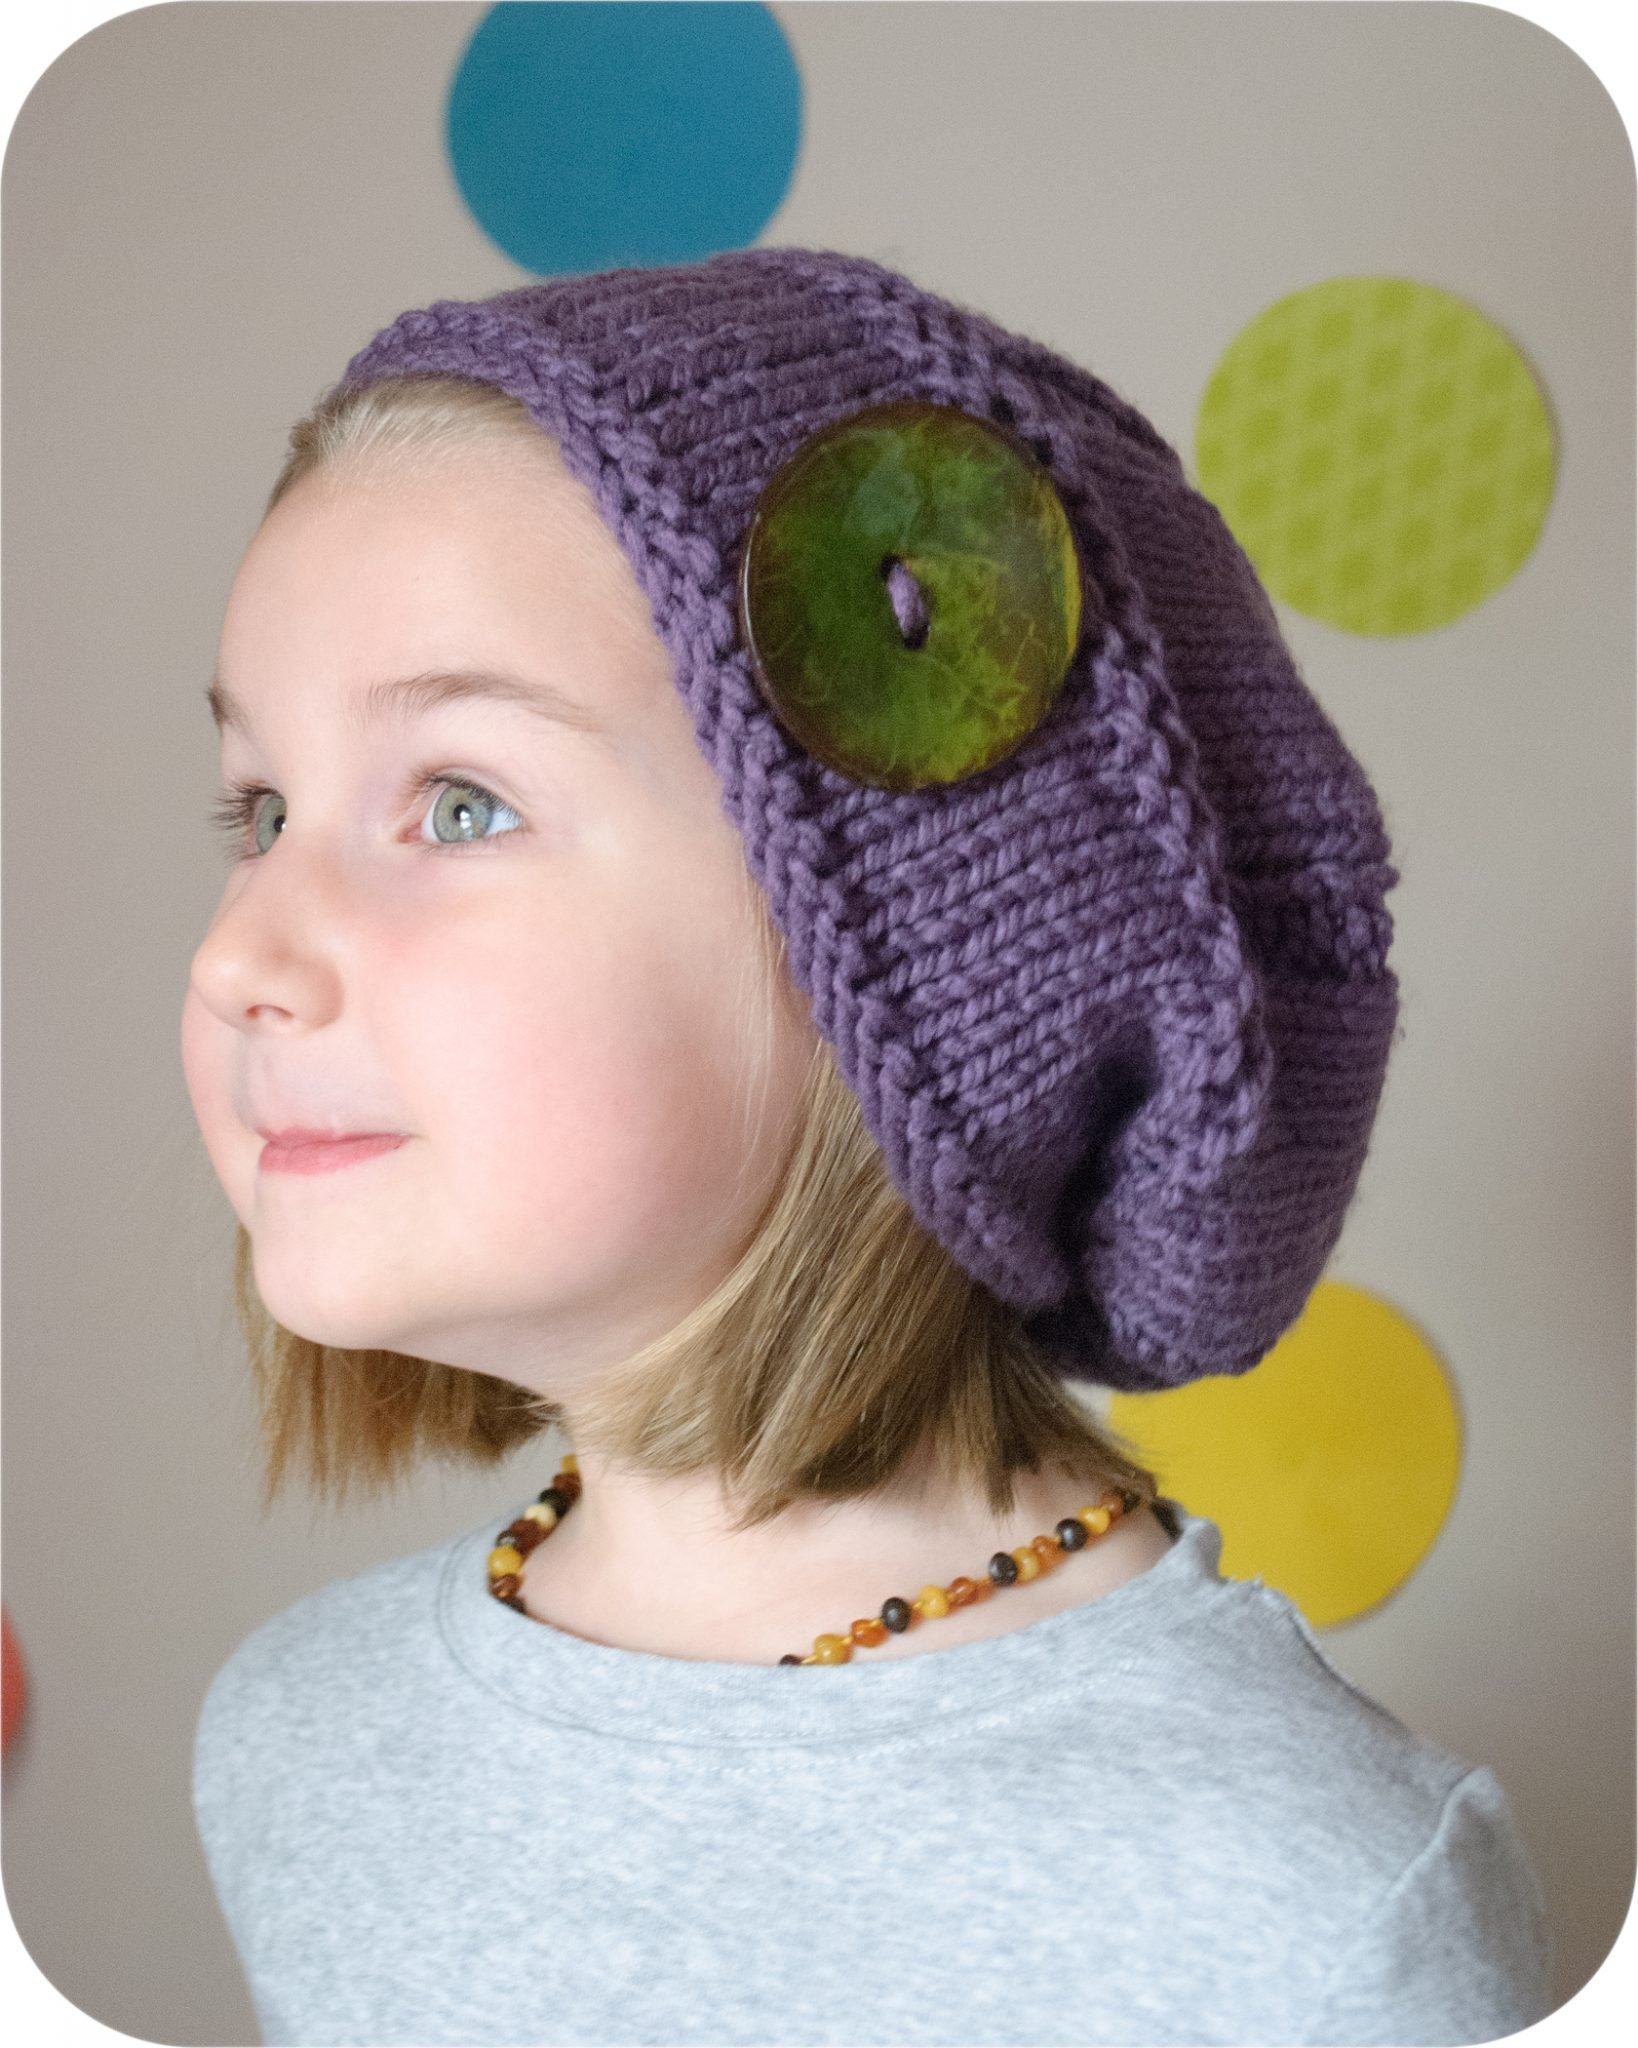 Monster Hat Knitting Pattern : The Bloemblad Hat PDF Knitting Pattern   The Eli Monster